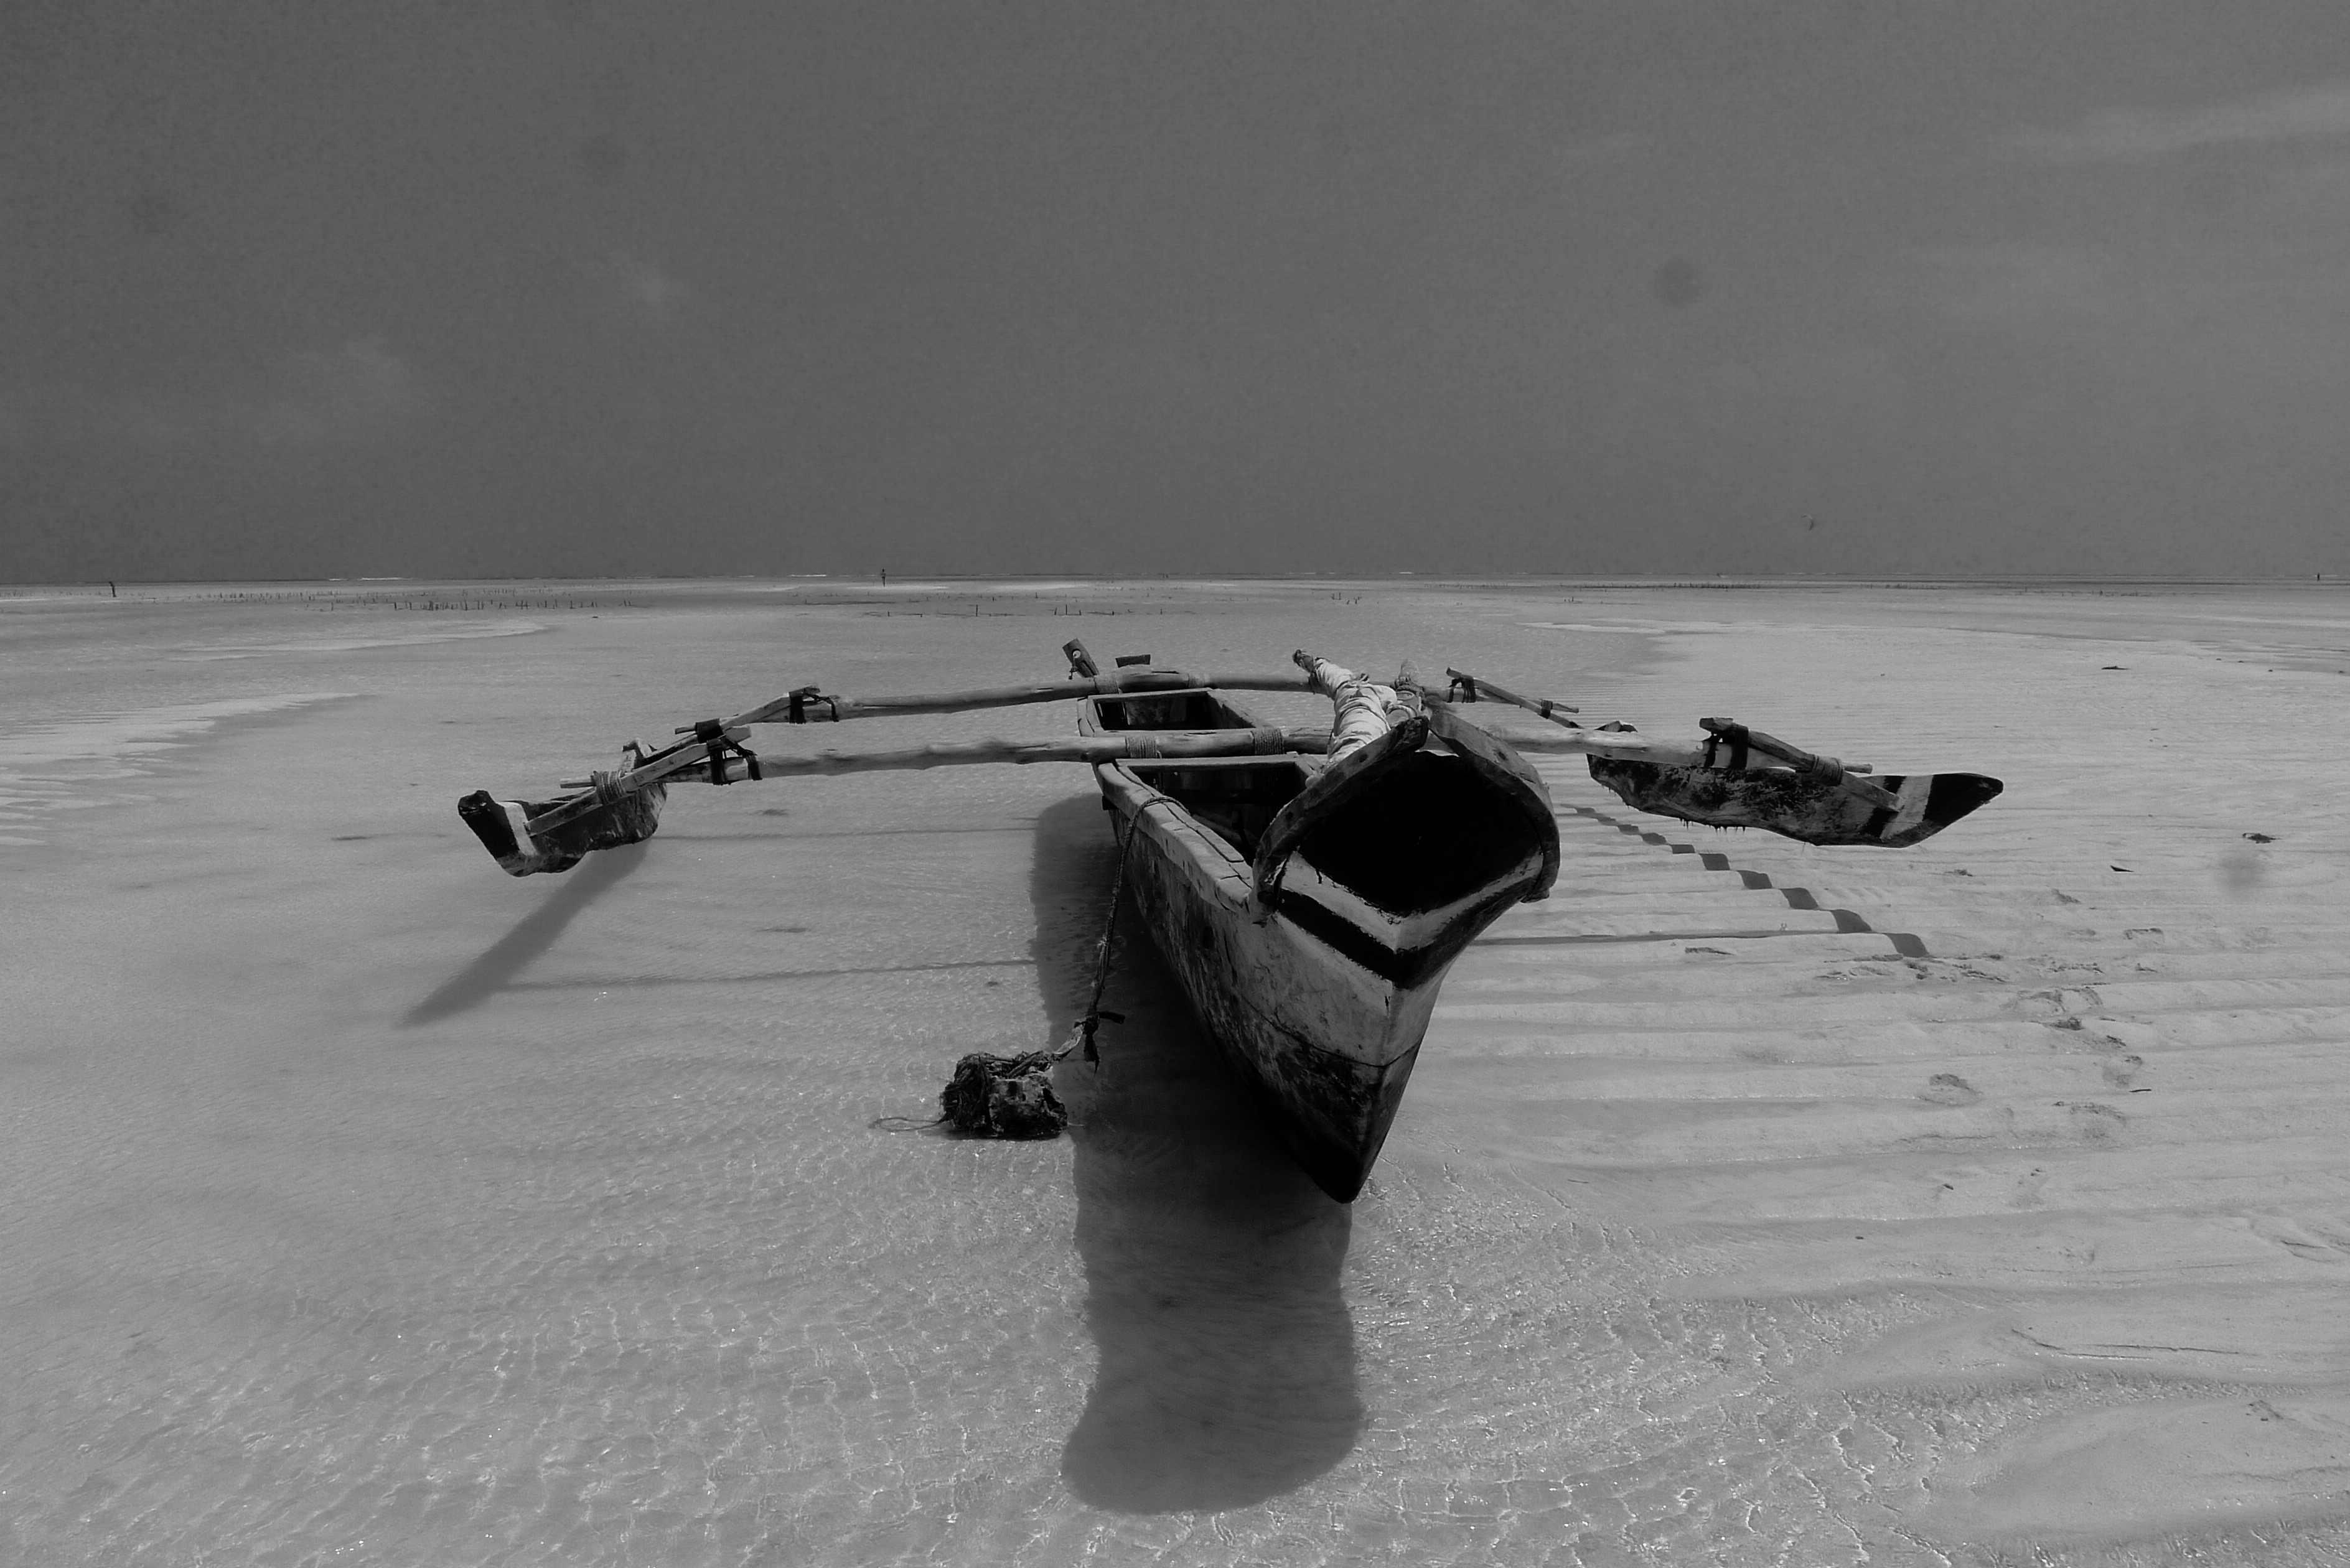 Fishing boat, Paje